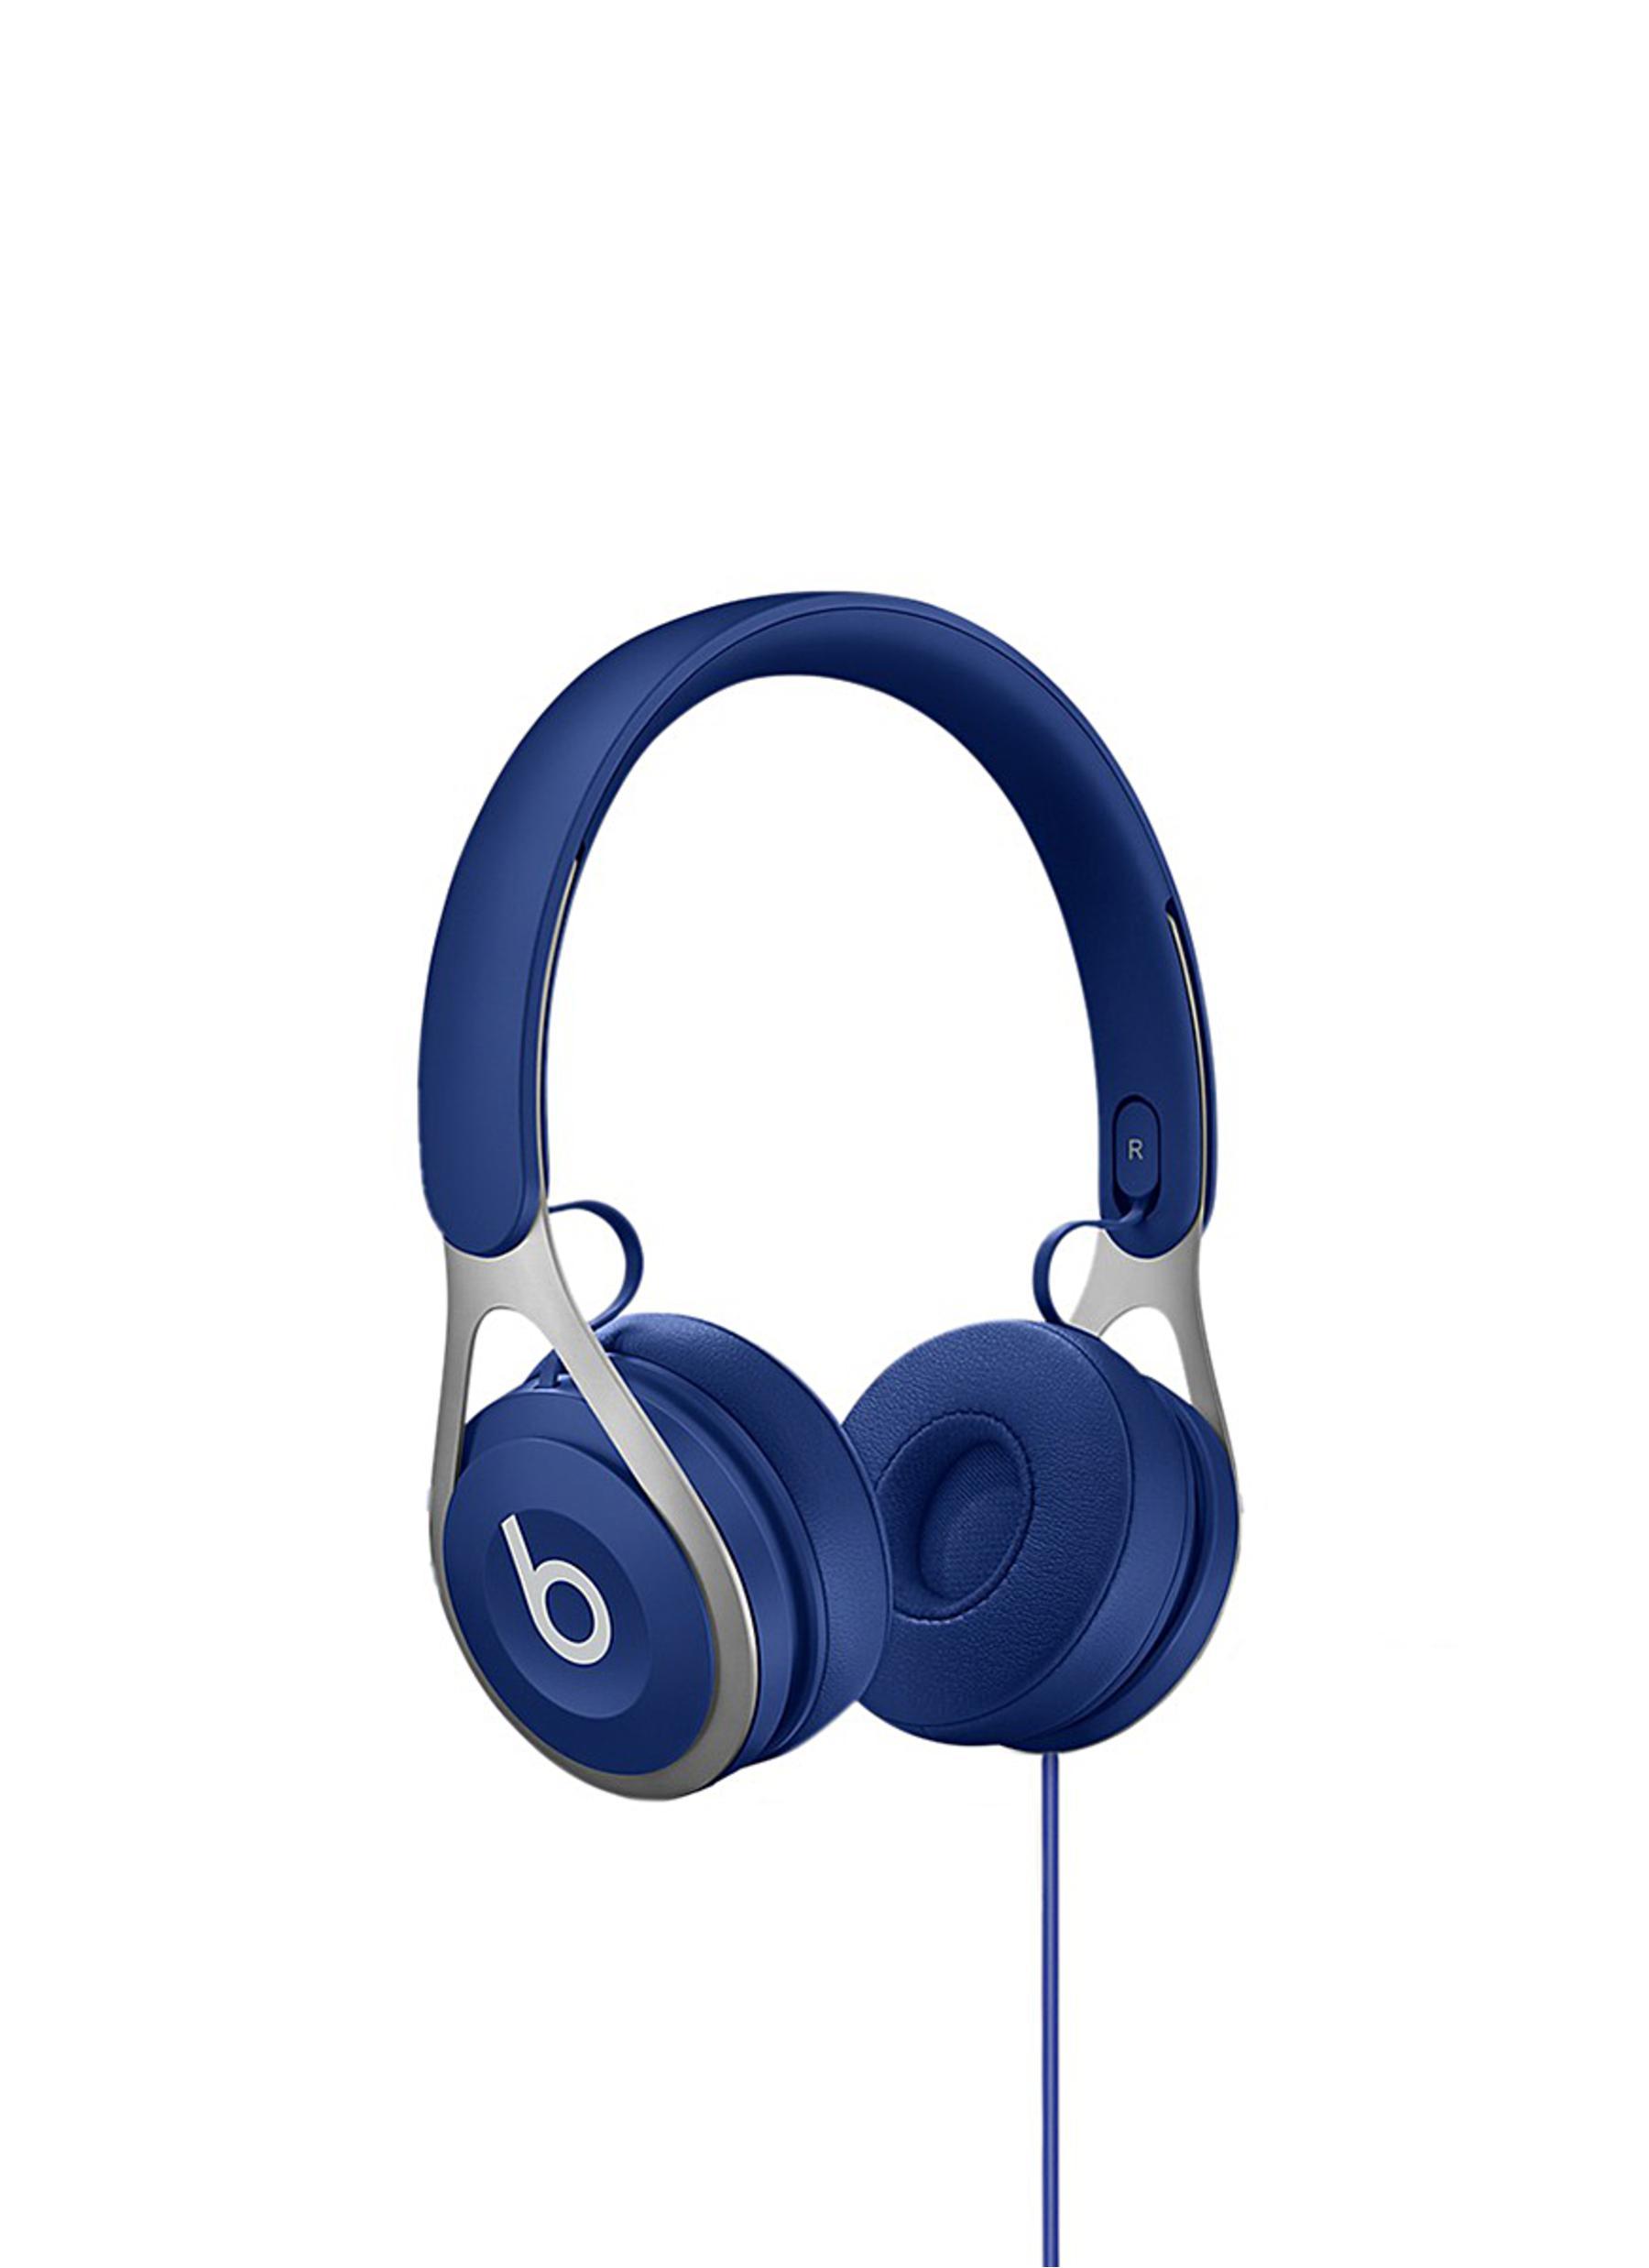 EP on-ear headphones by Beats